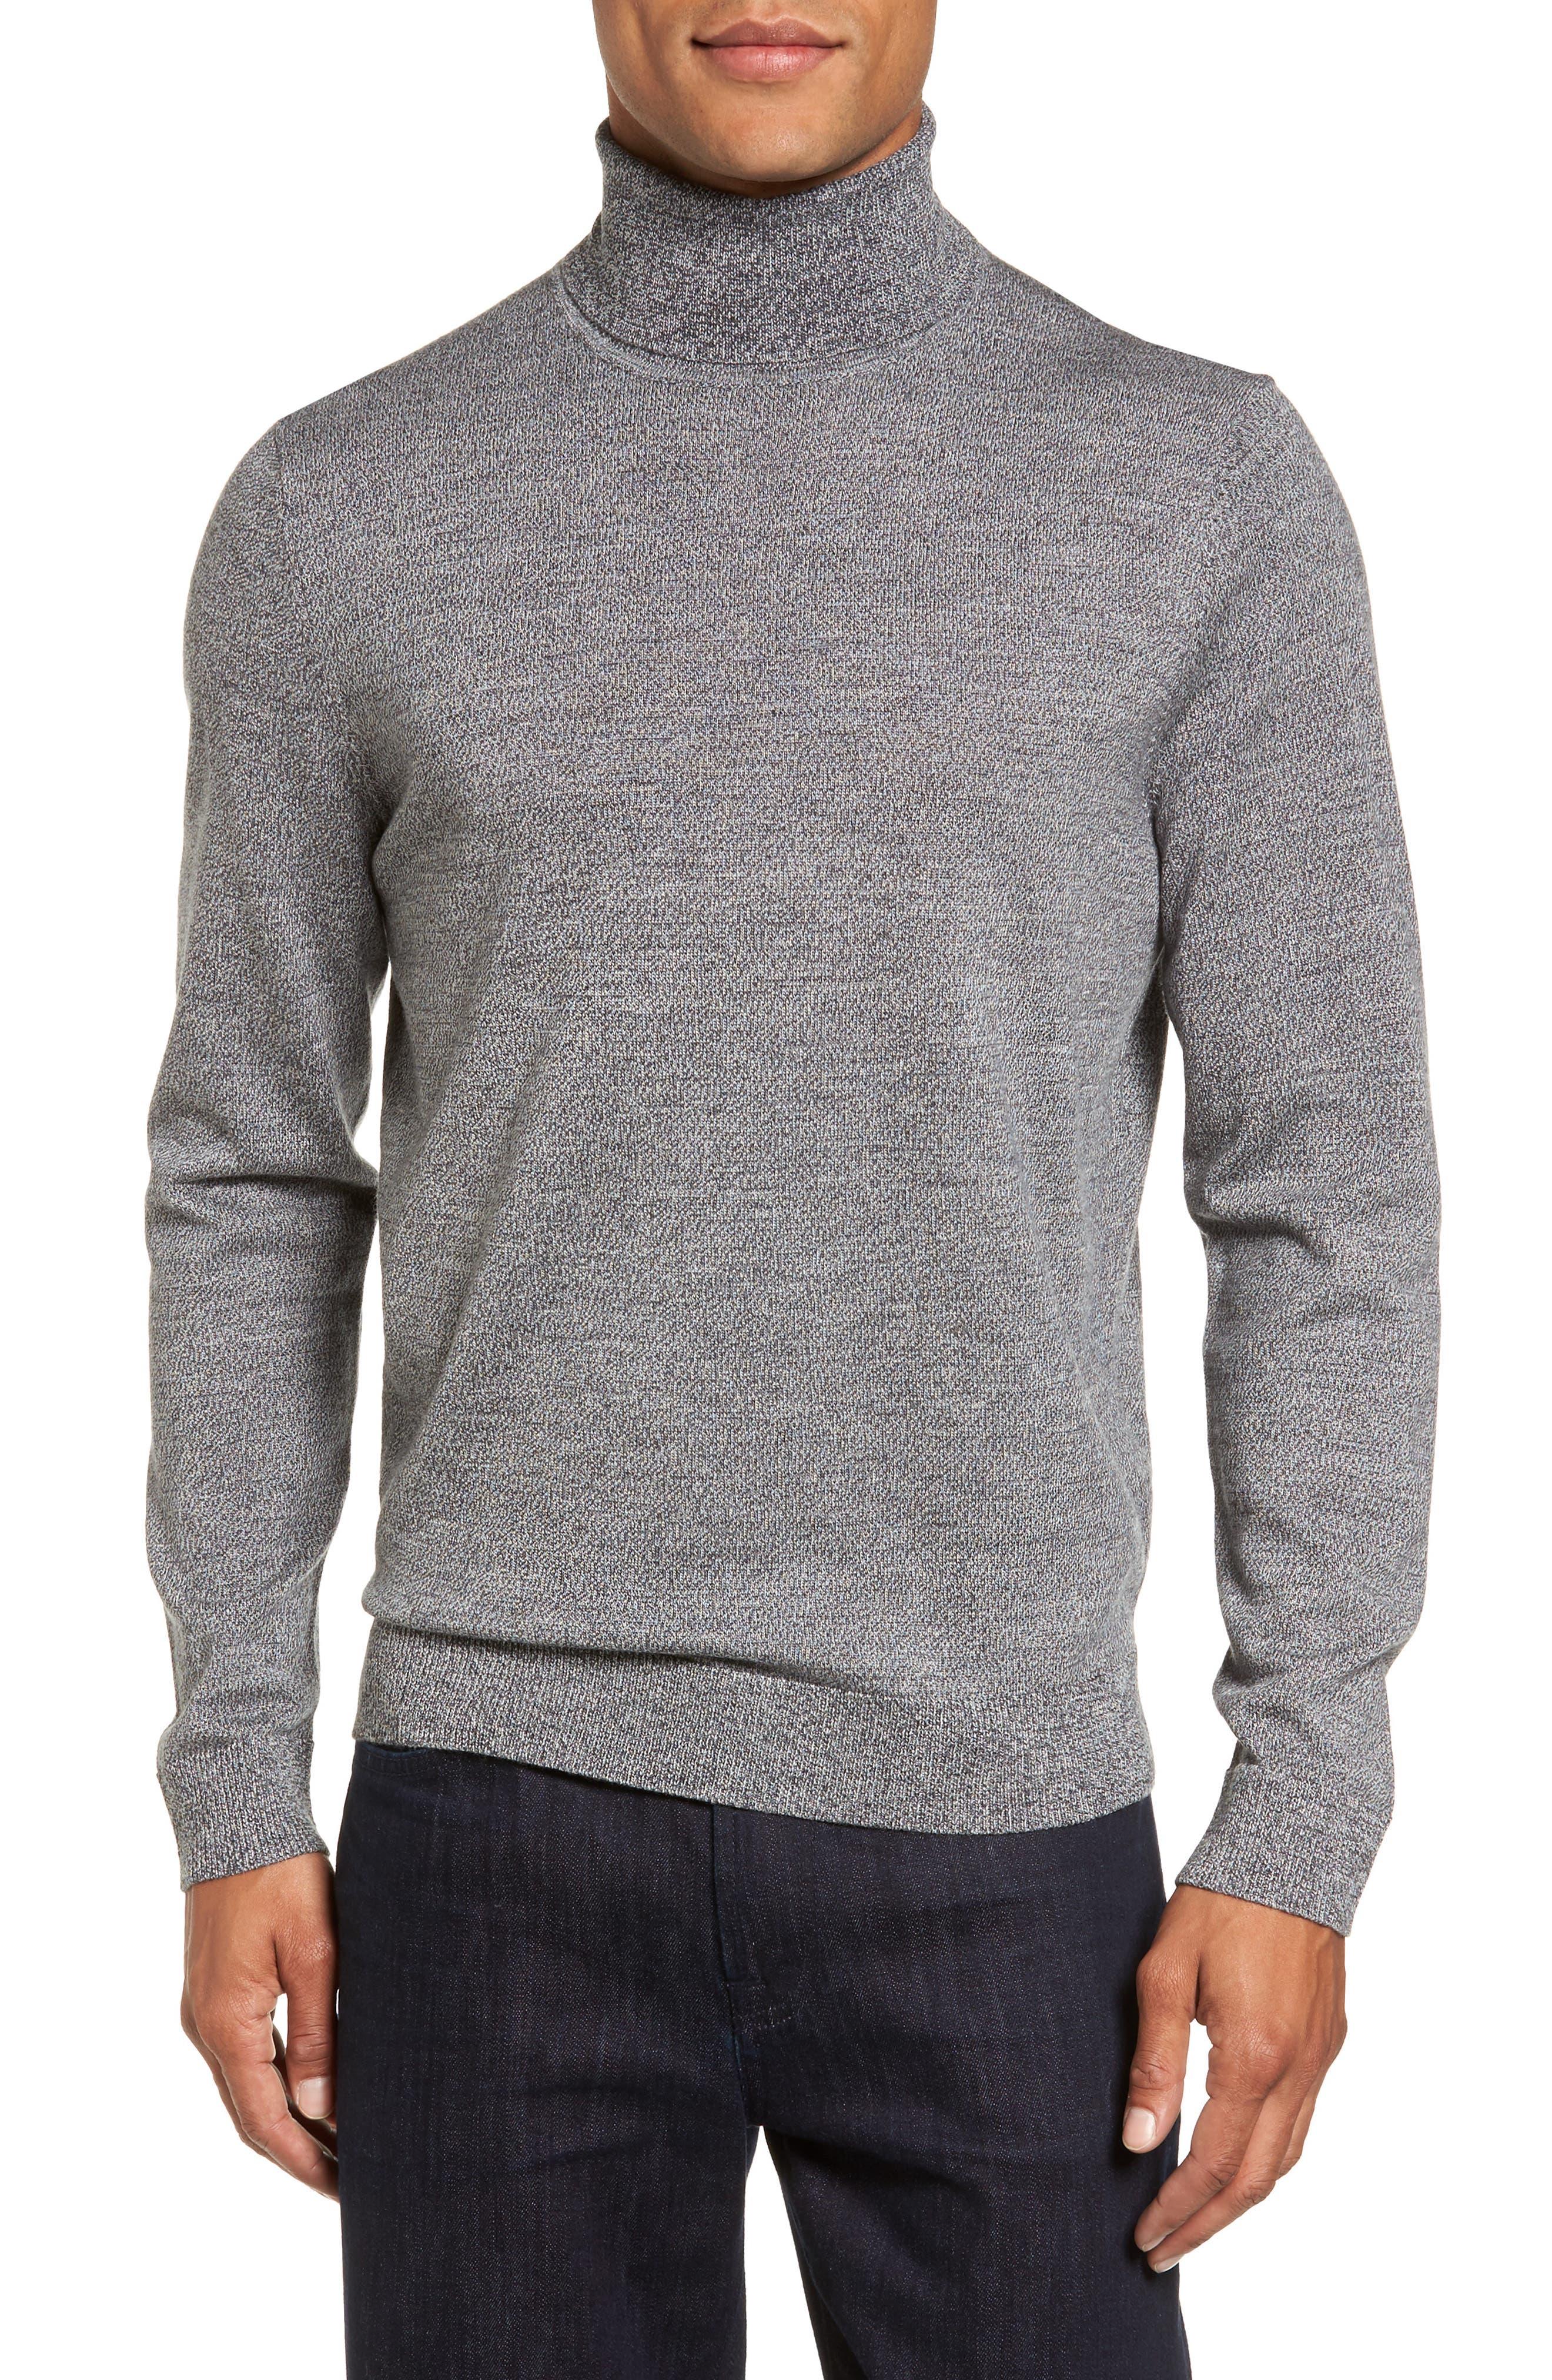 Merino Wool Turtleneck Sweater,                             Main thumbnail 1, color,                             Grey Shade Marl